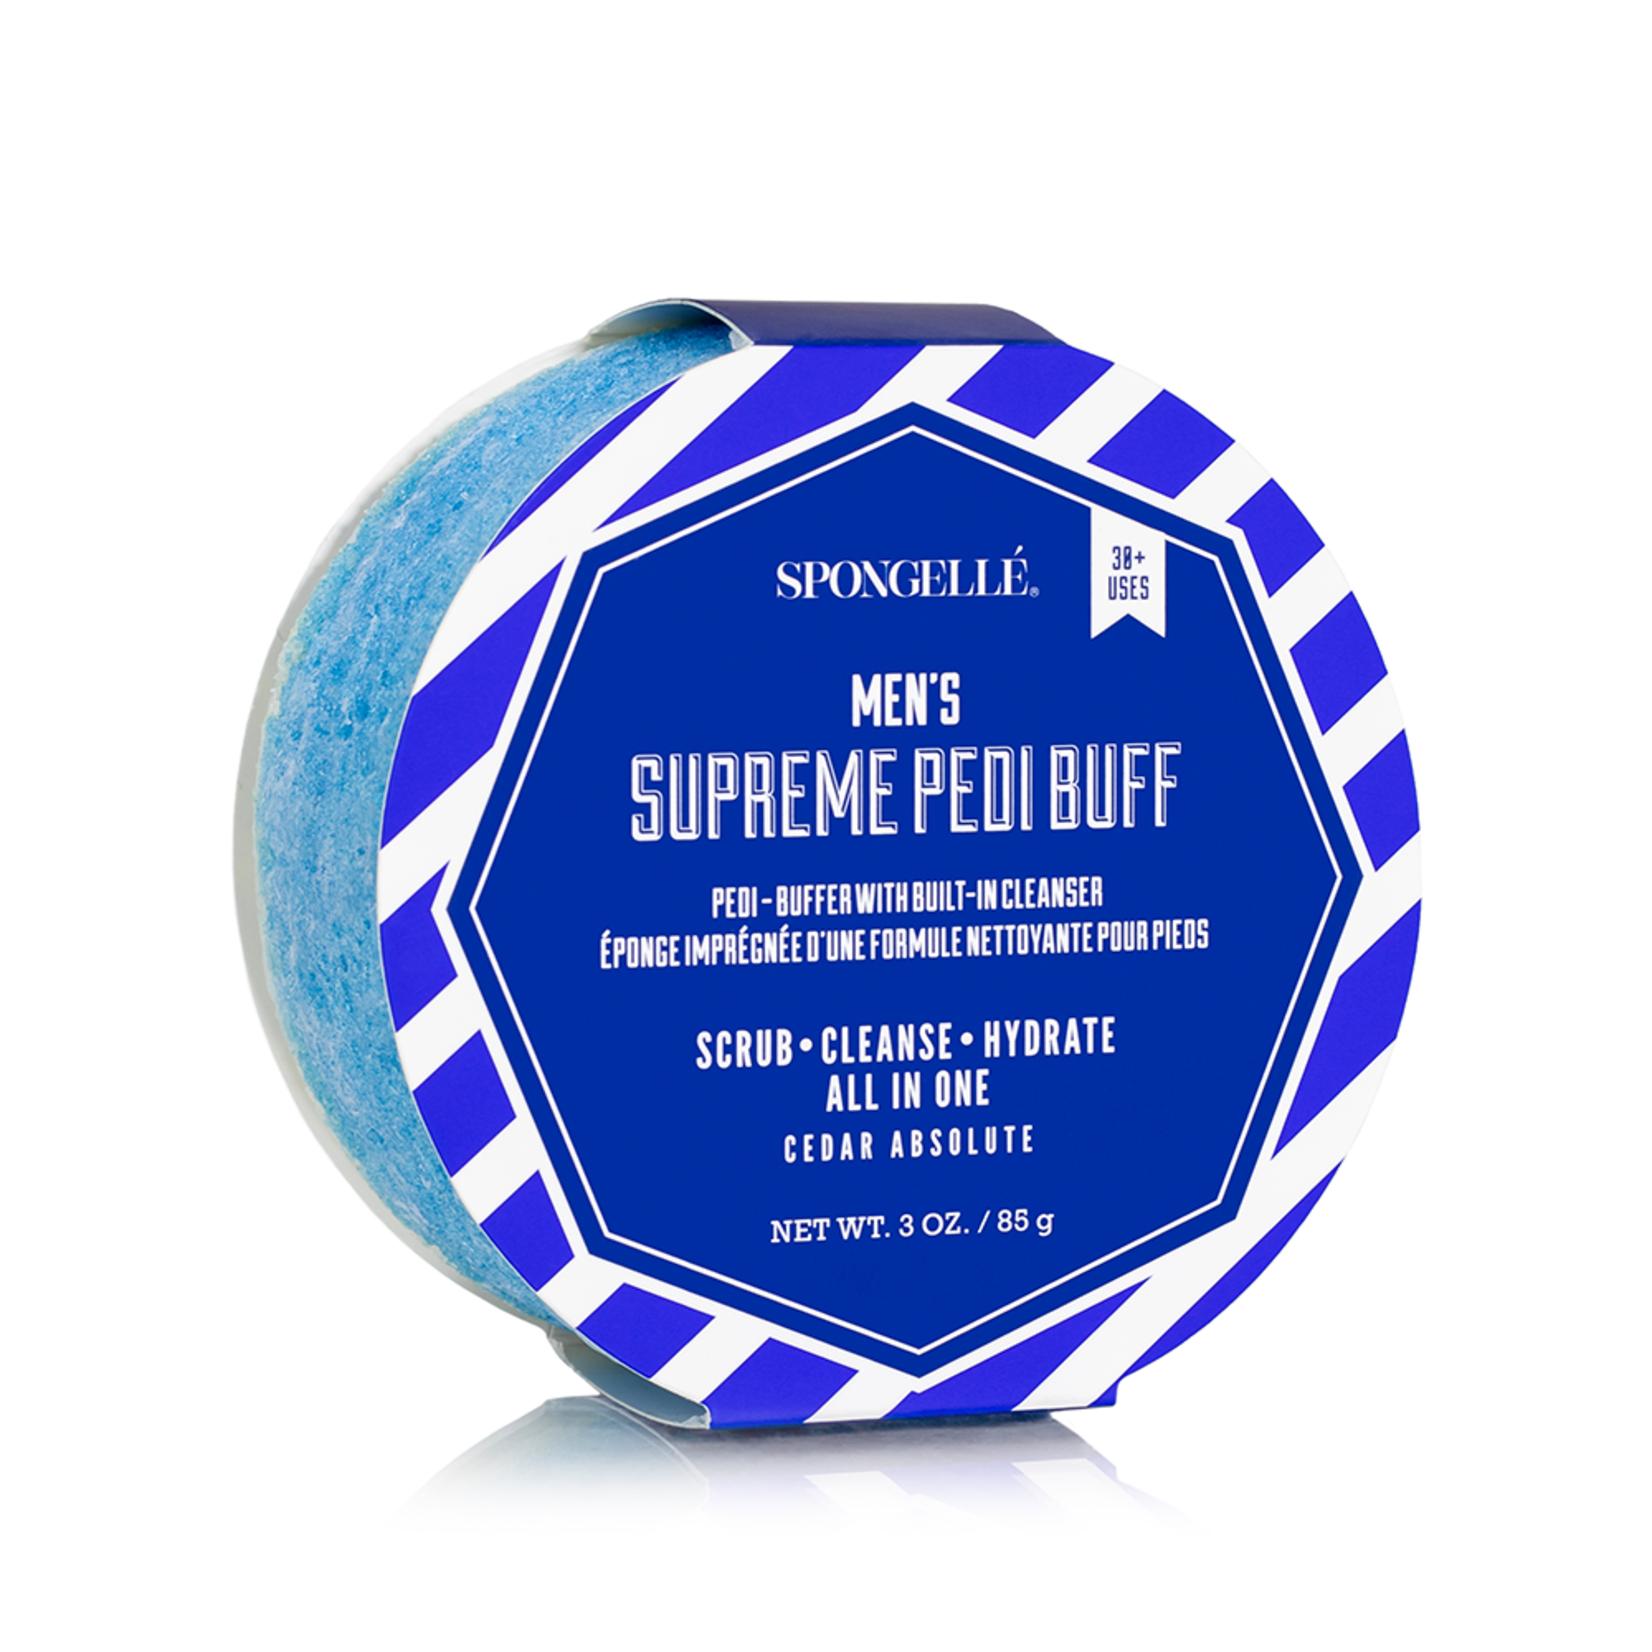 Spongelle Men's Supreme Pedi Buffer | Cedar Absolute